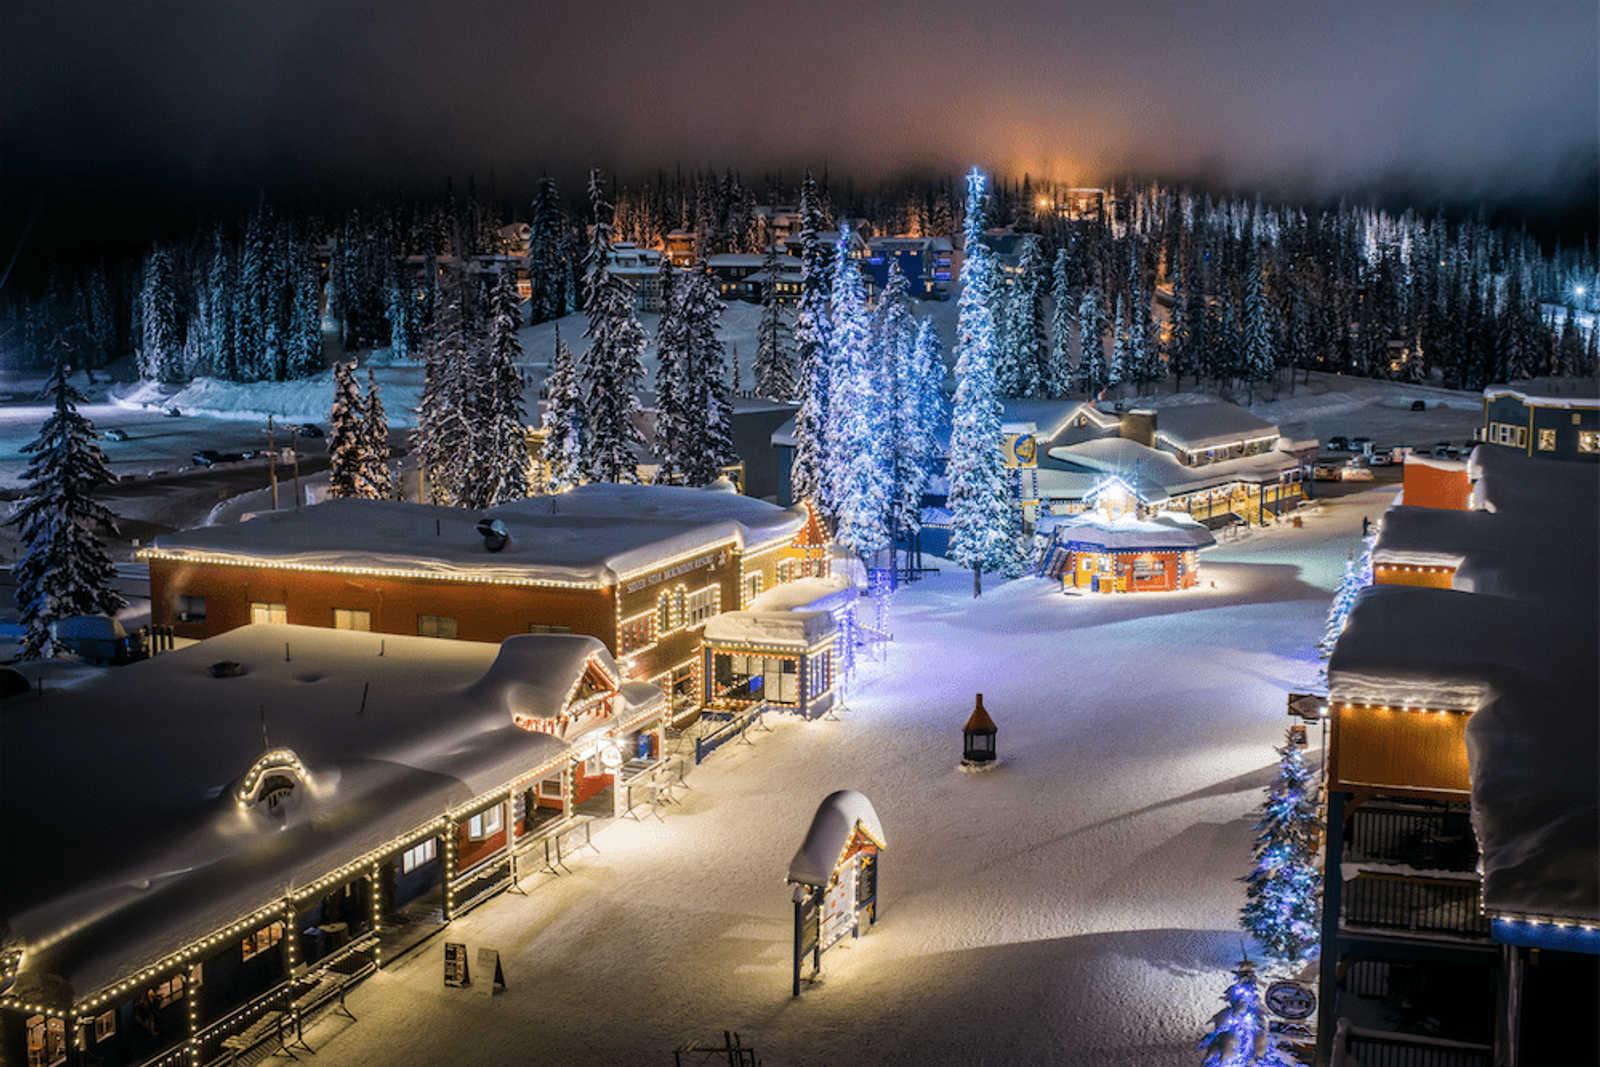 SilverStar Mountain Resort Village